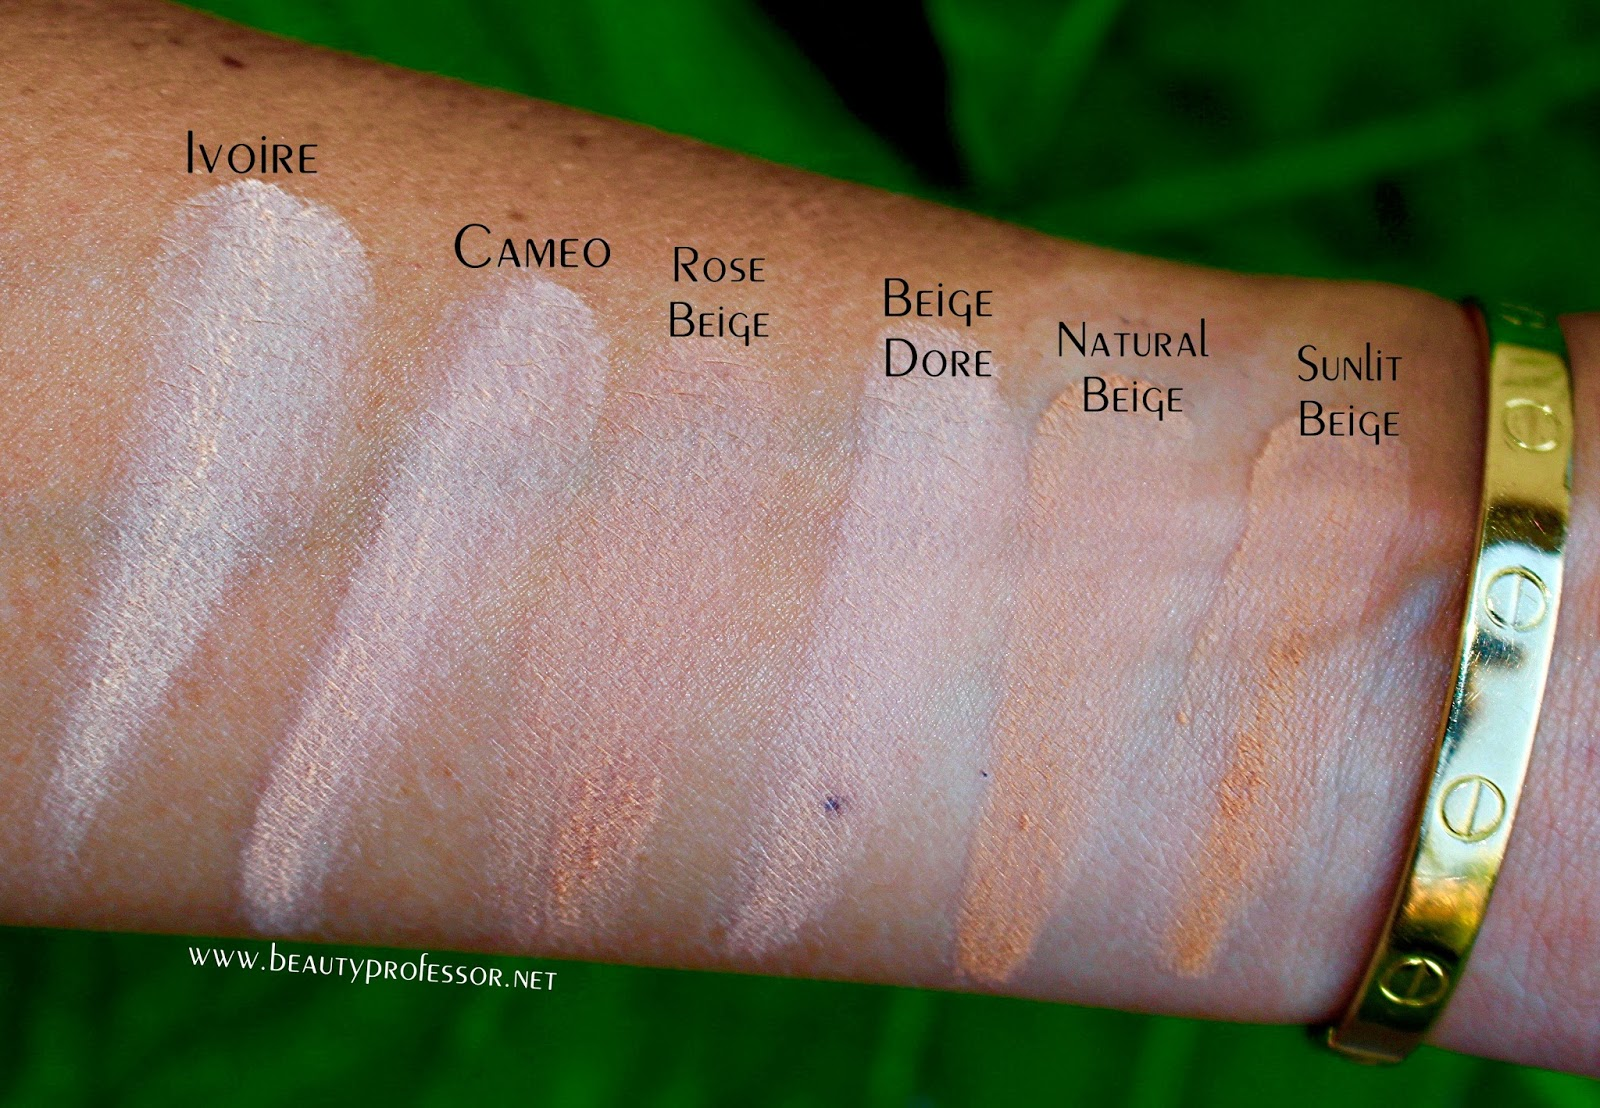 Cellular Treatment Powder Blush by la prairie #5